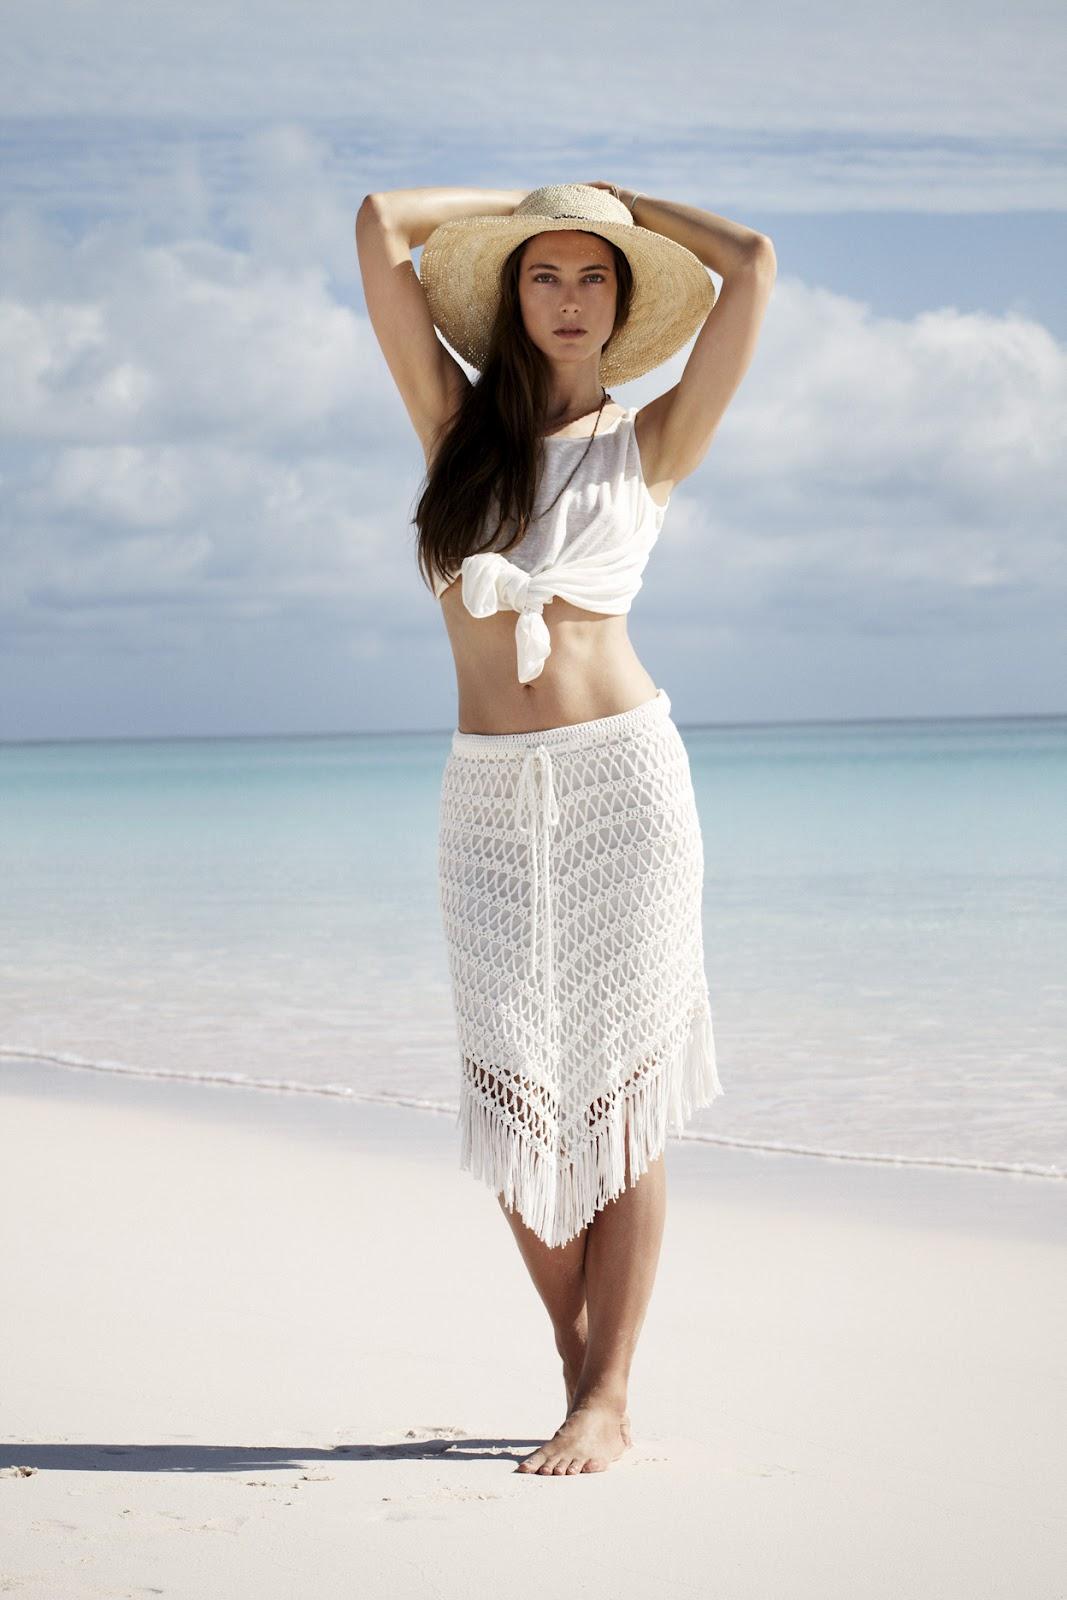 Www Videoimagen Es Poses De Modelo En La Playa